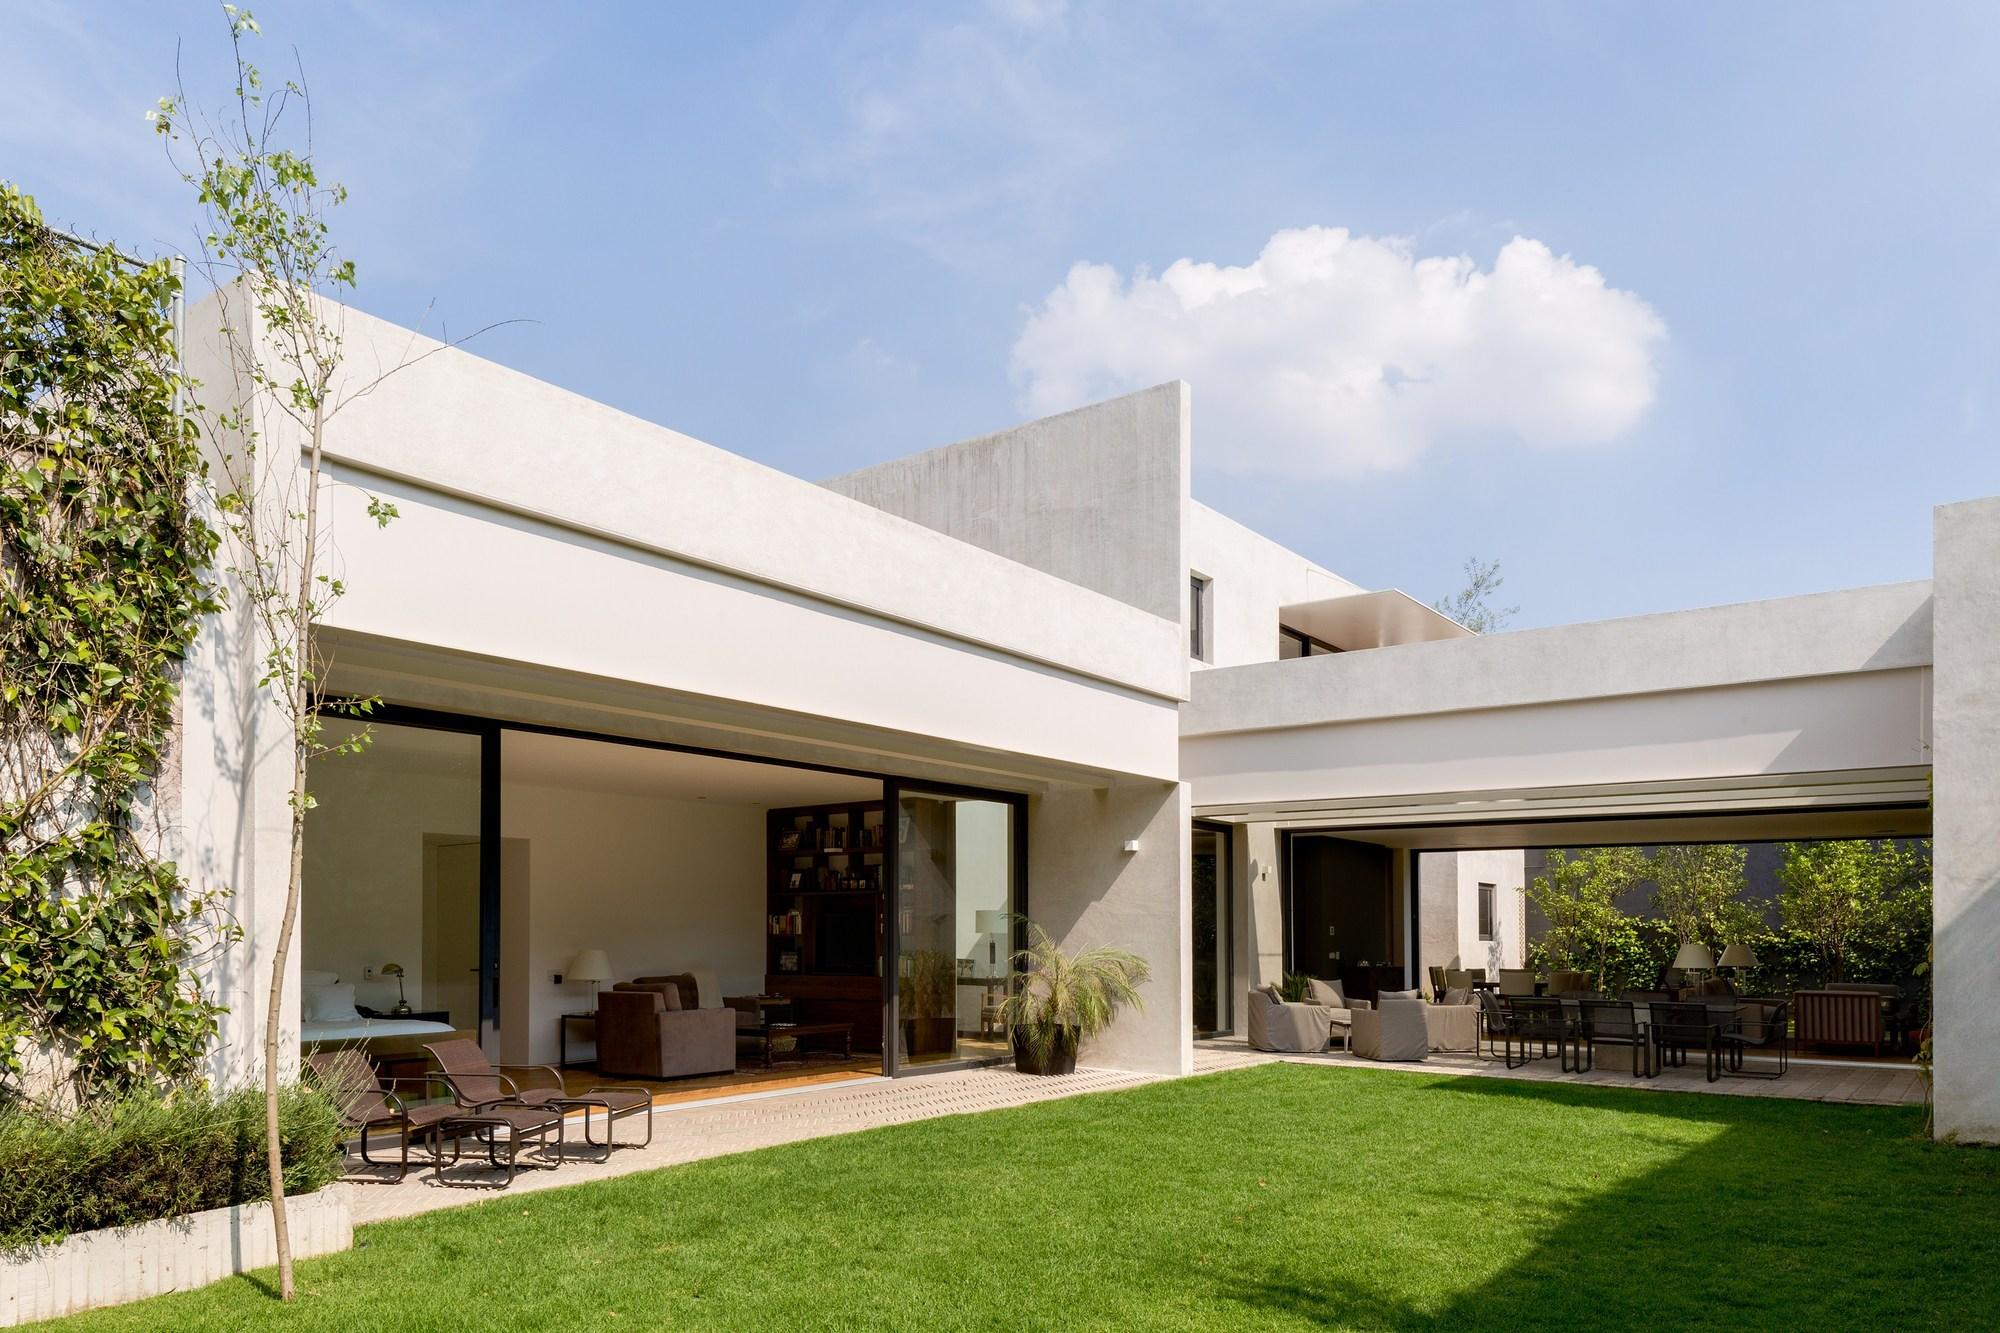 Casa jard n dcpp arquitectos archdaily m xico for Modelos jardines para casas pequenas